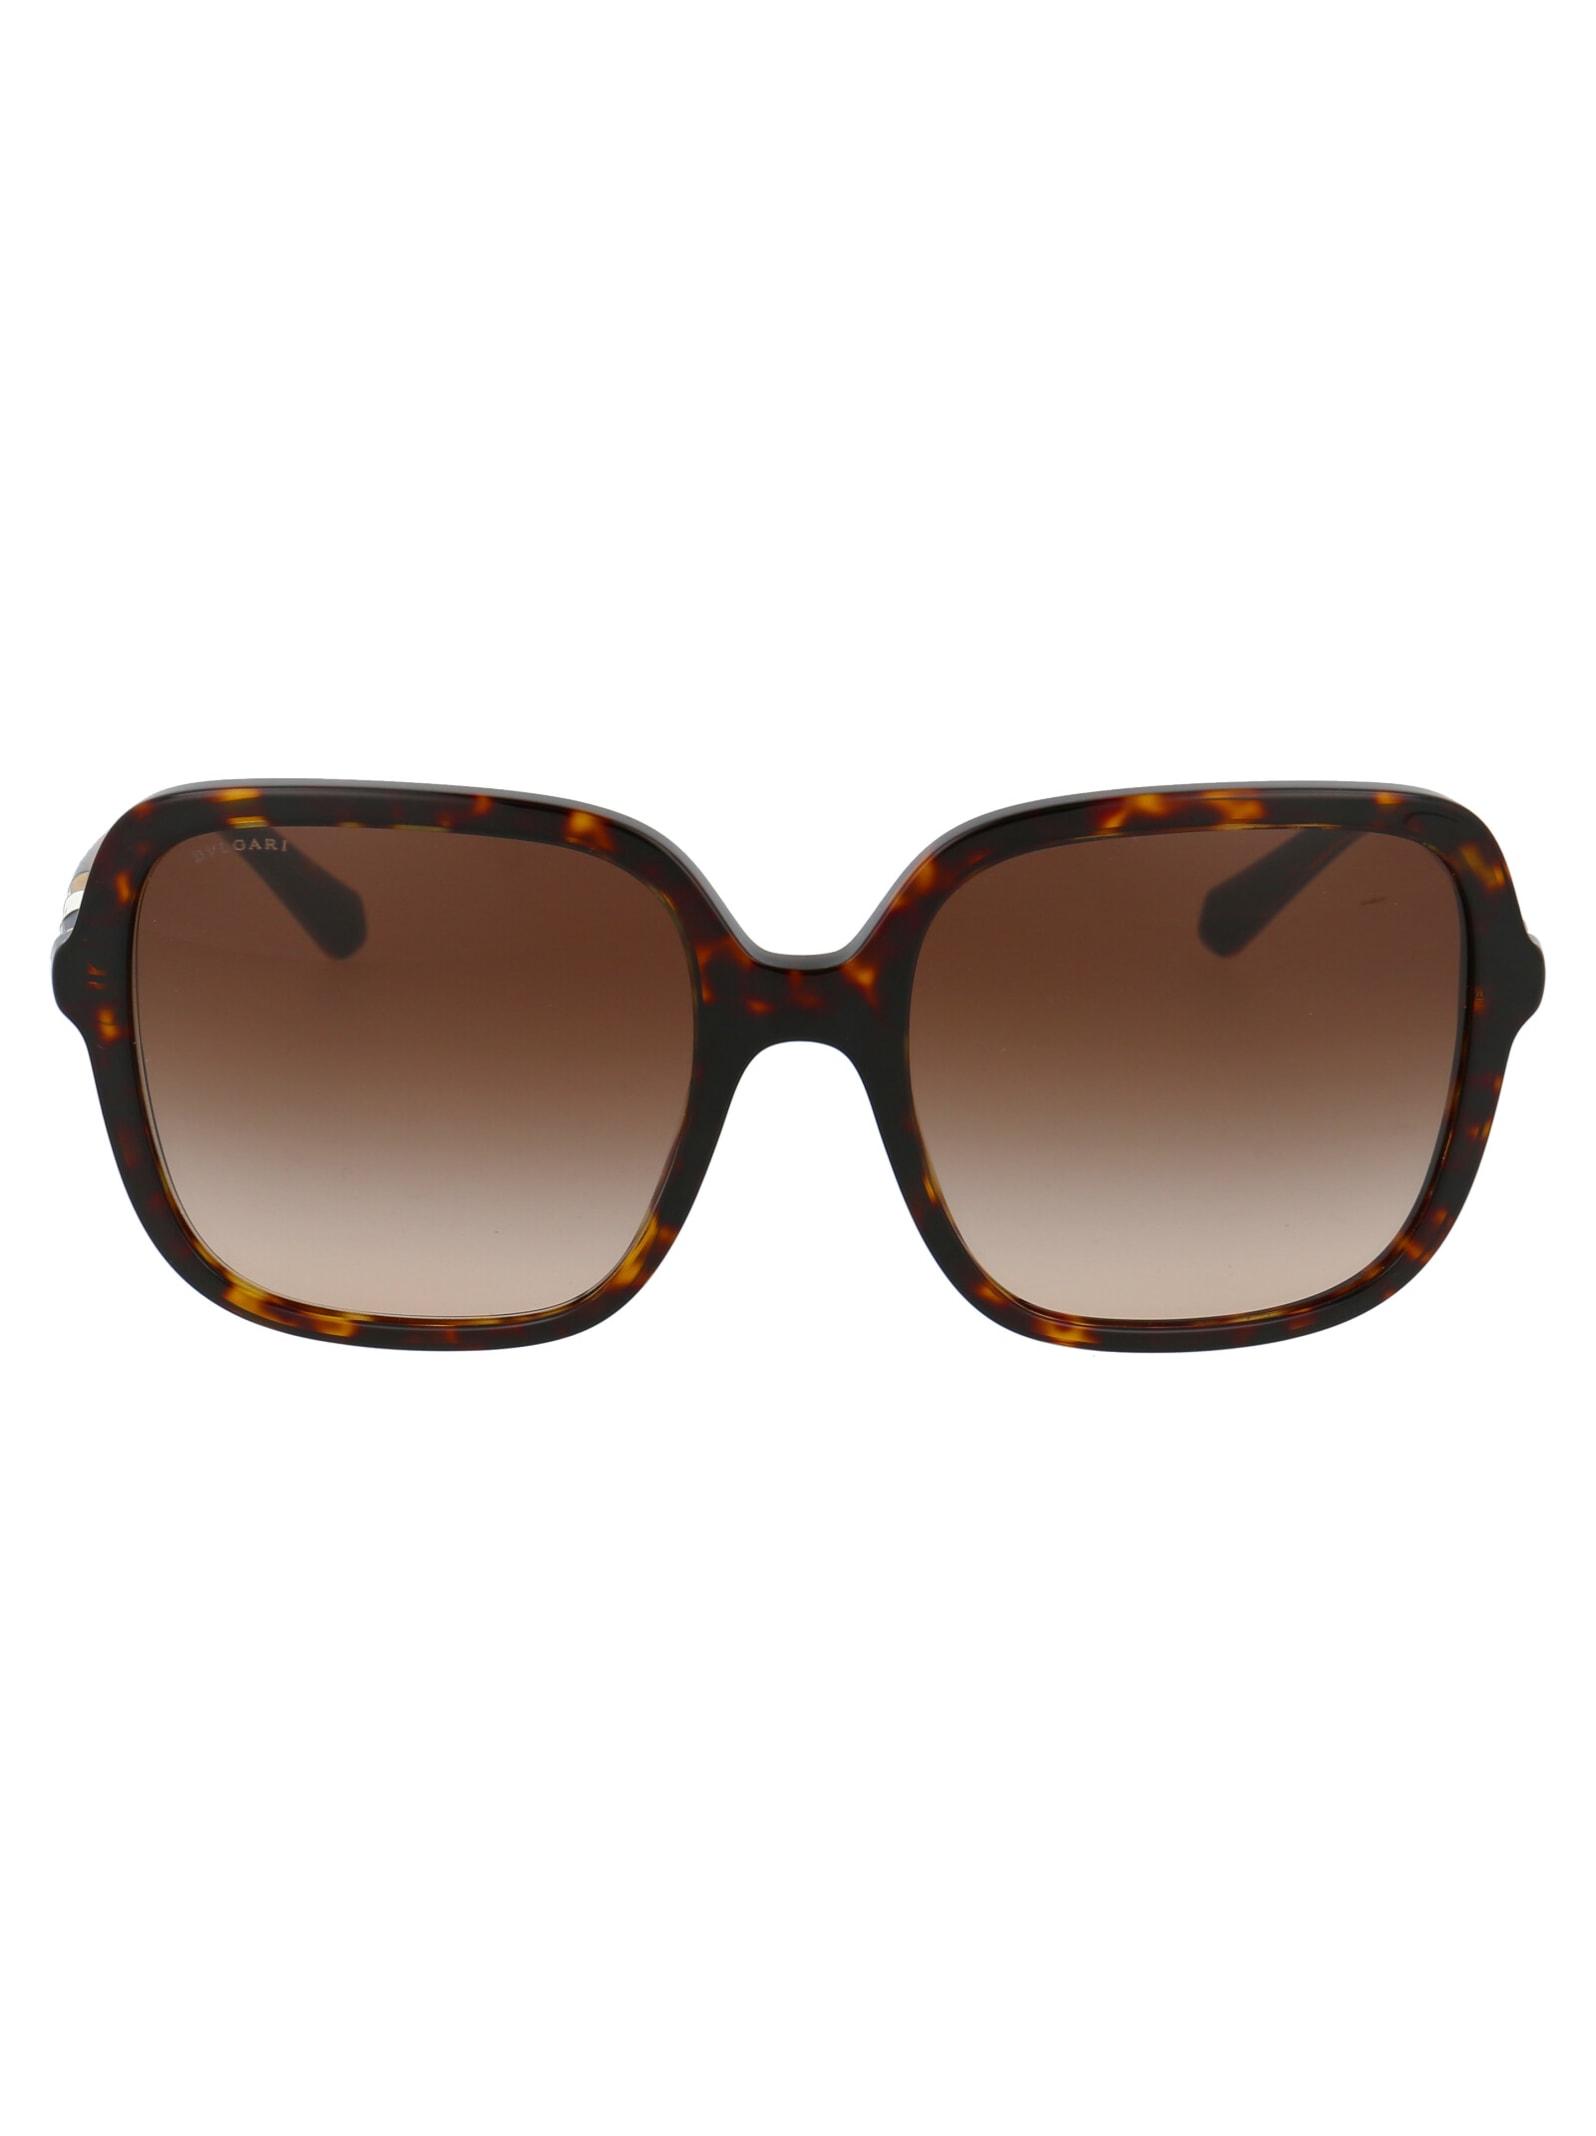 0bv8228b Sunglasses